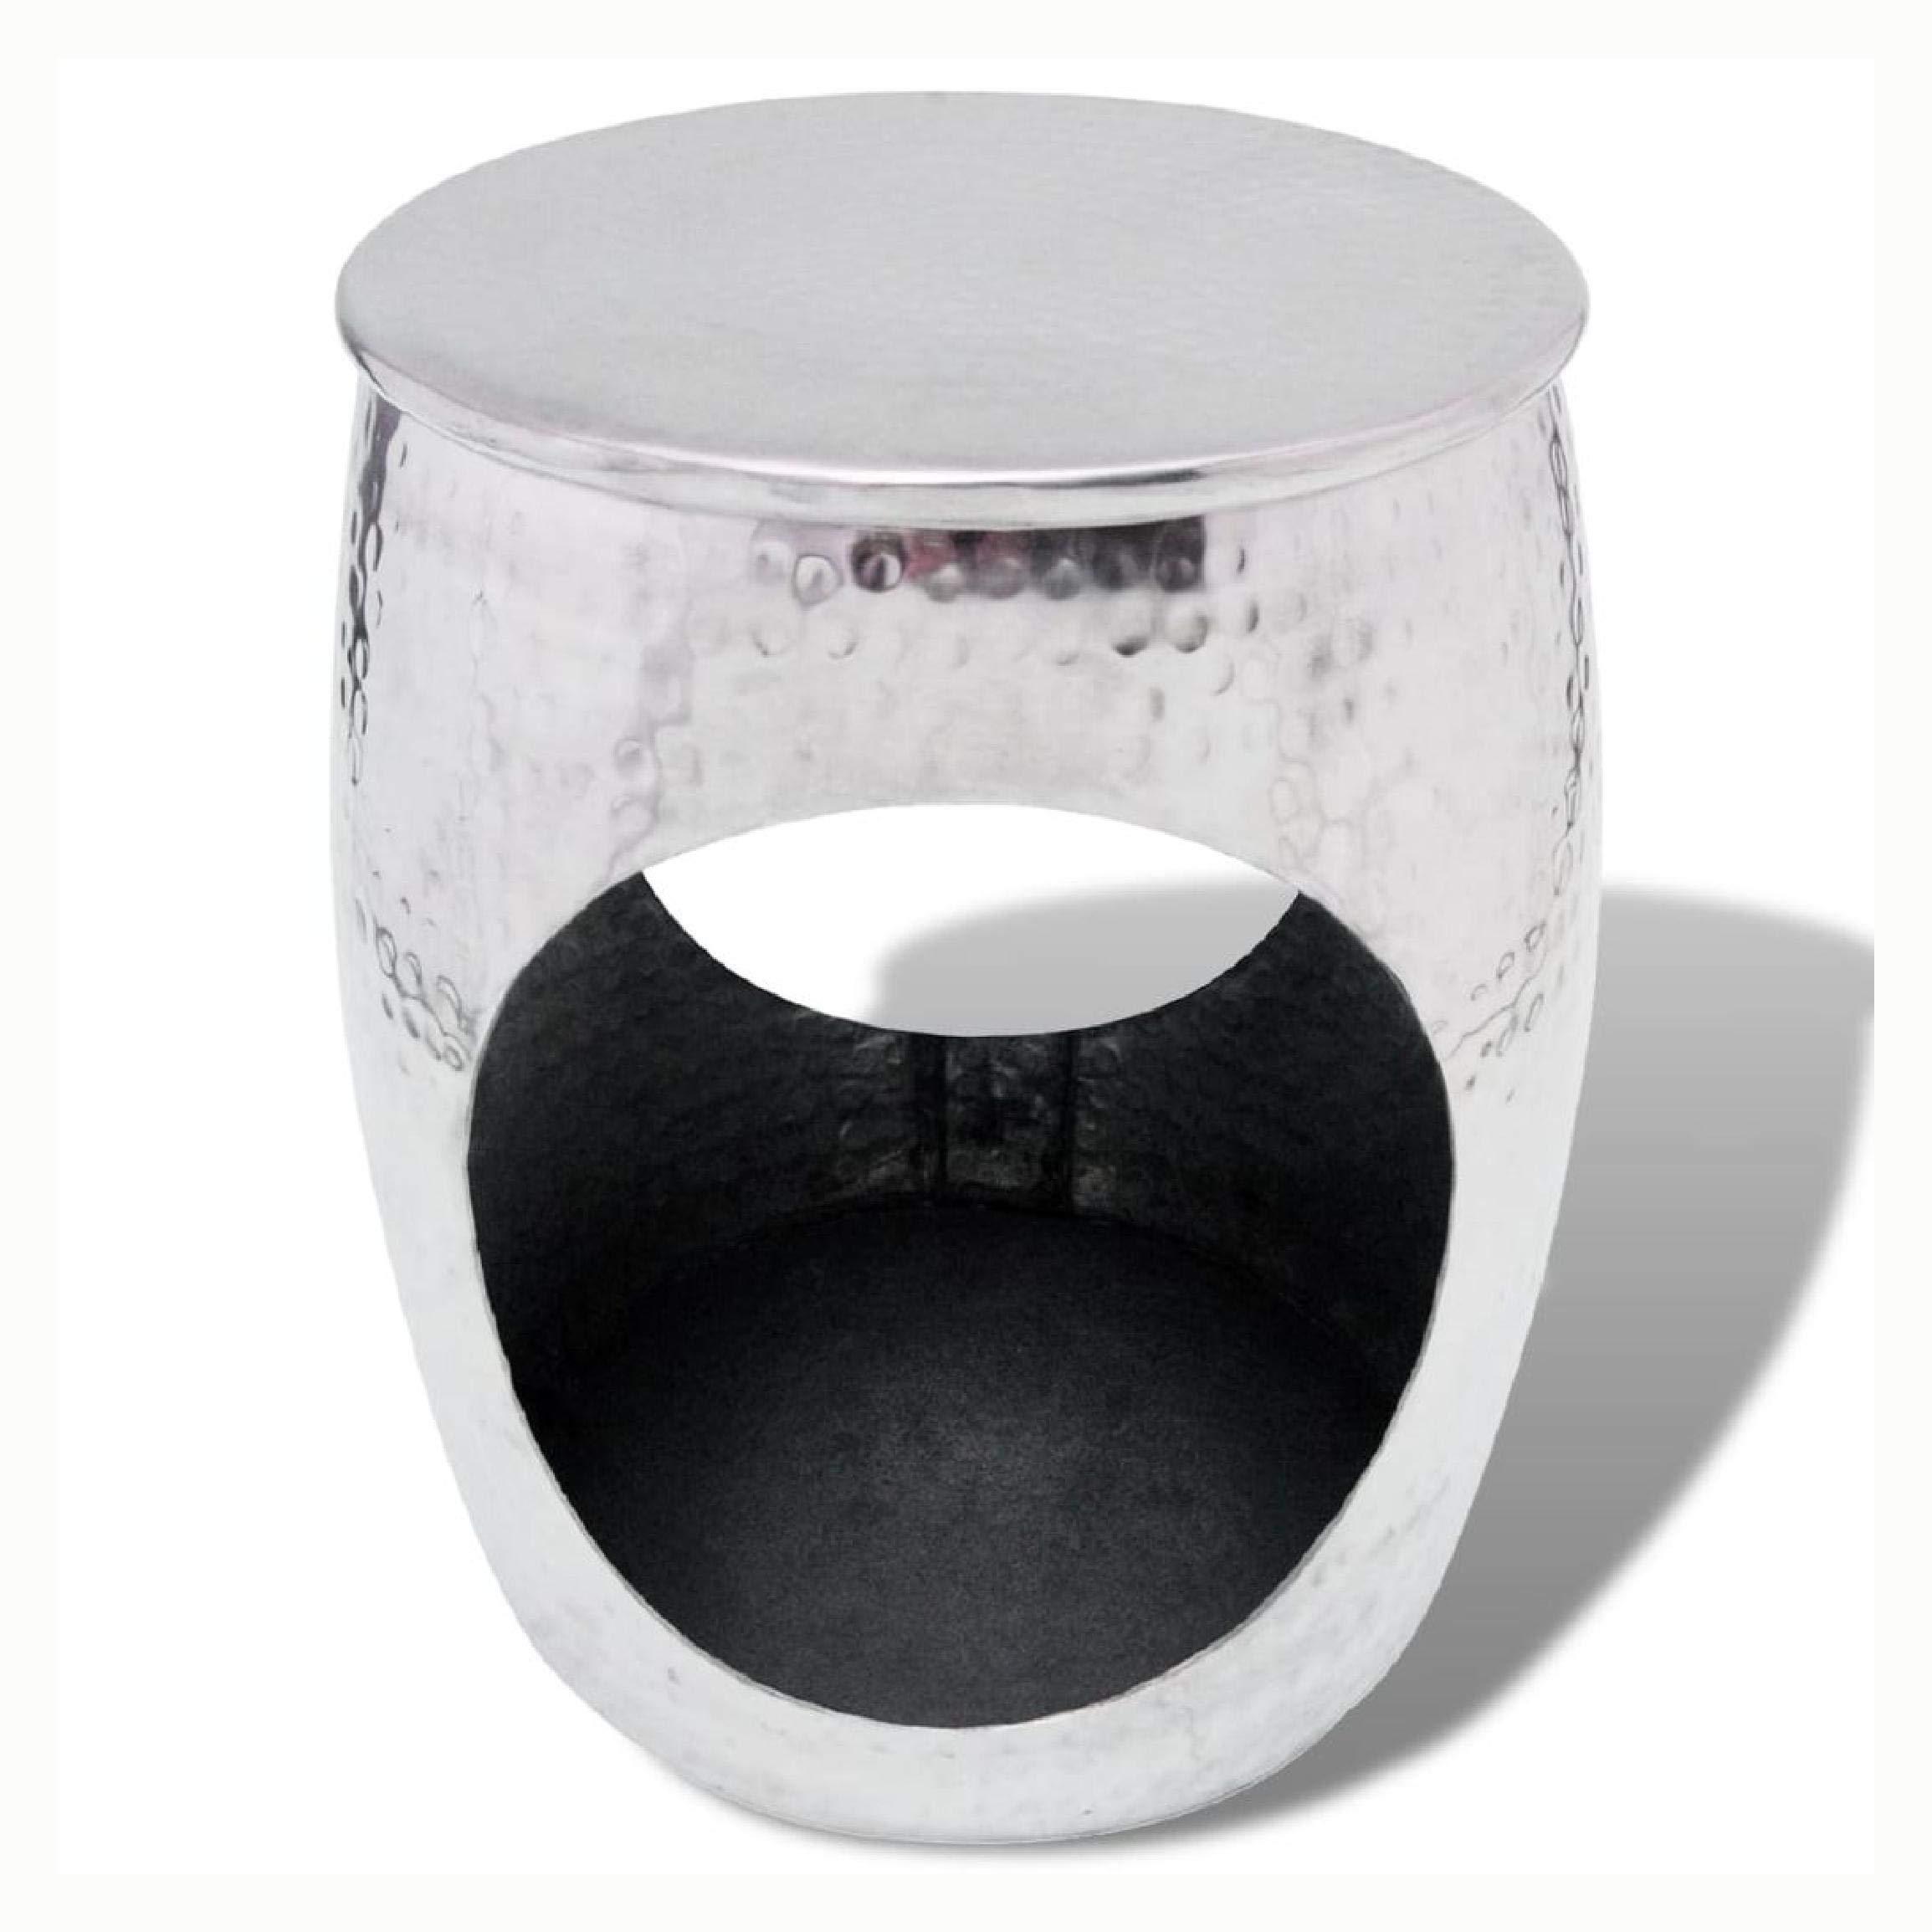 K&A Company Hocker/Side Table Barrel Shape Aluminum Silver by K&A Company (Image #1)